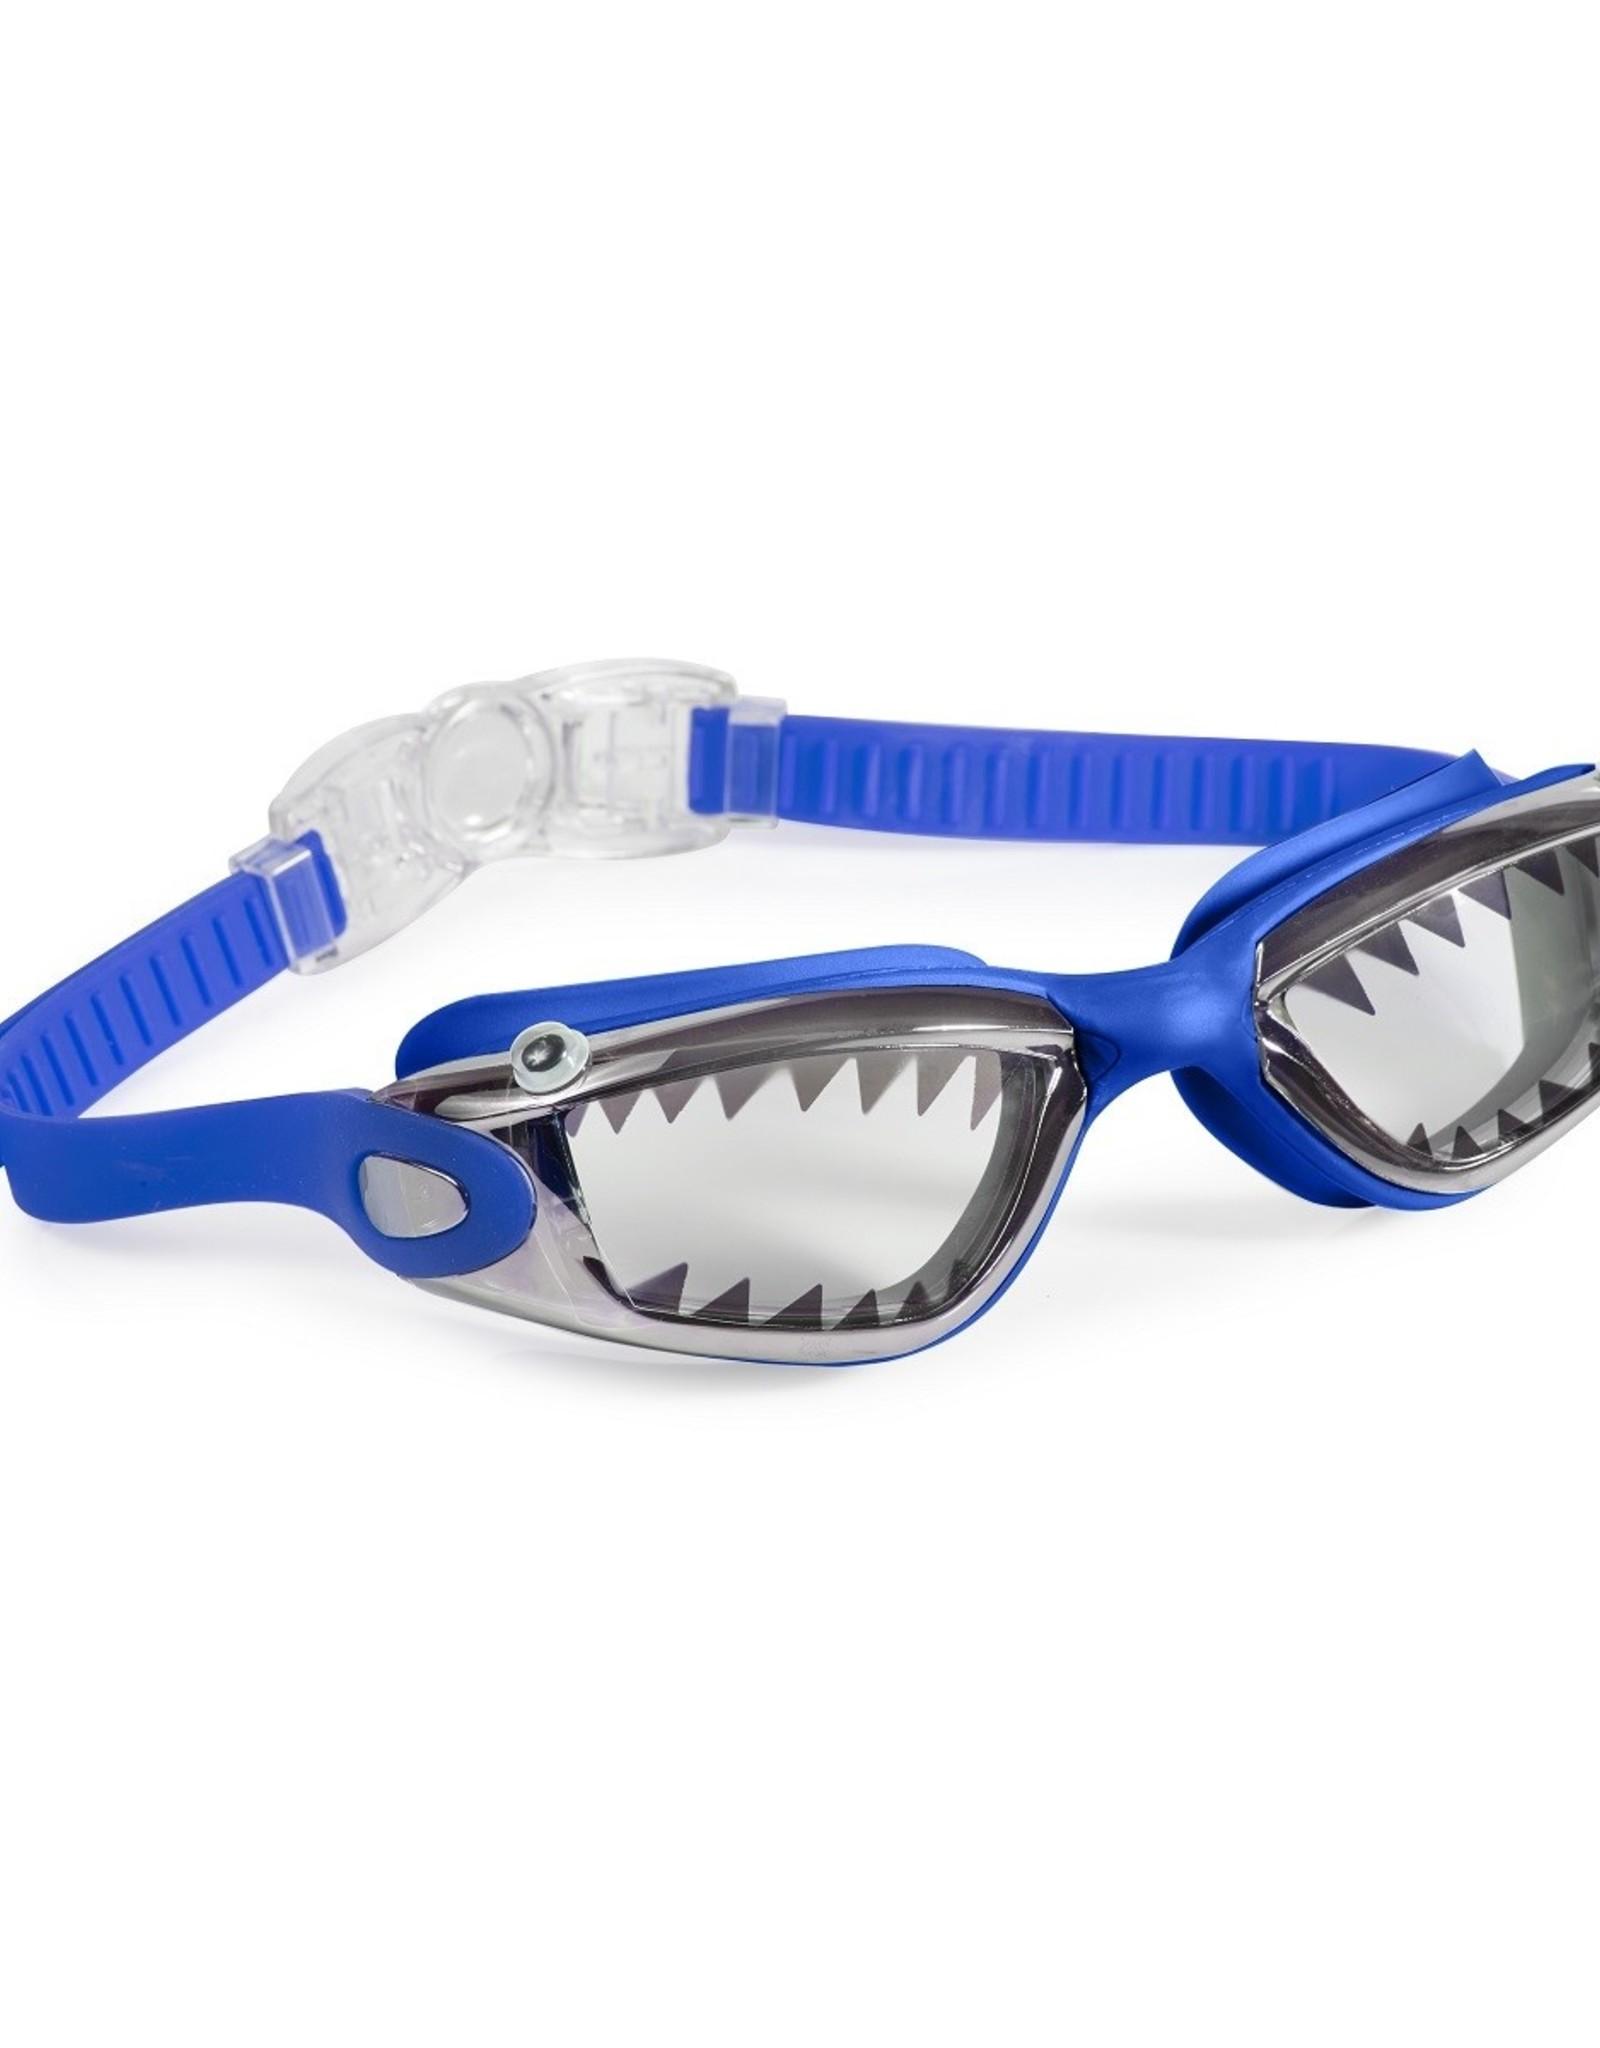 Bling2o Bling2o Goggles - Jawsome Royal Reef